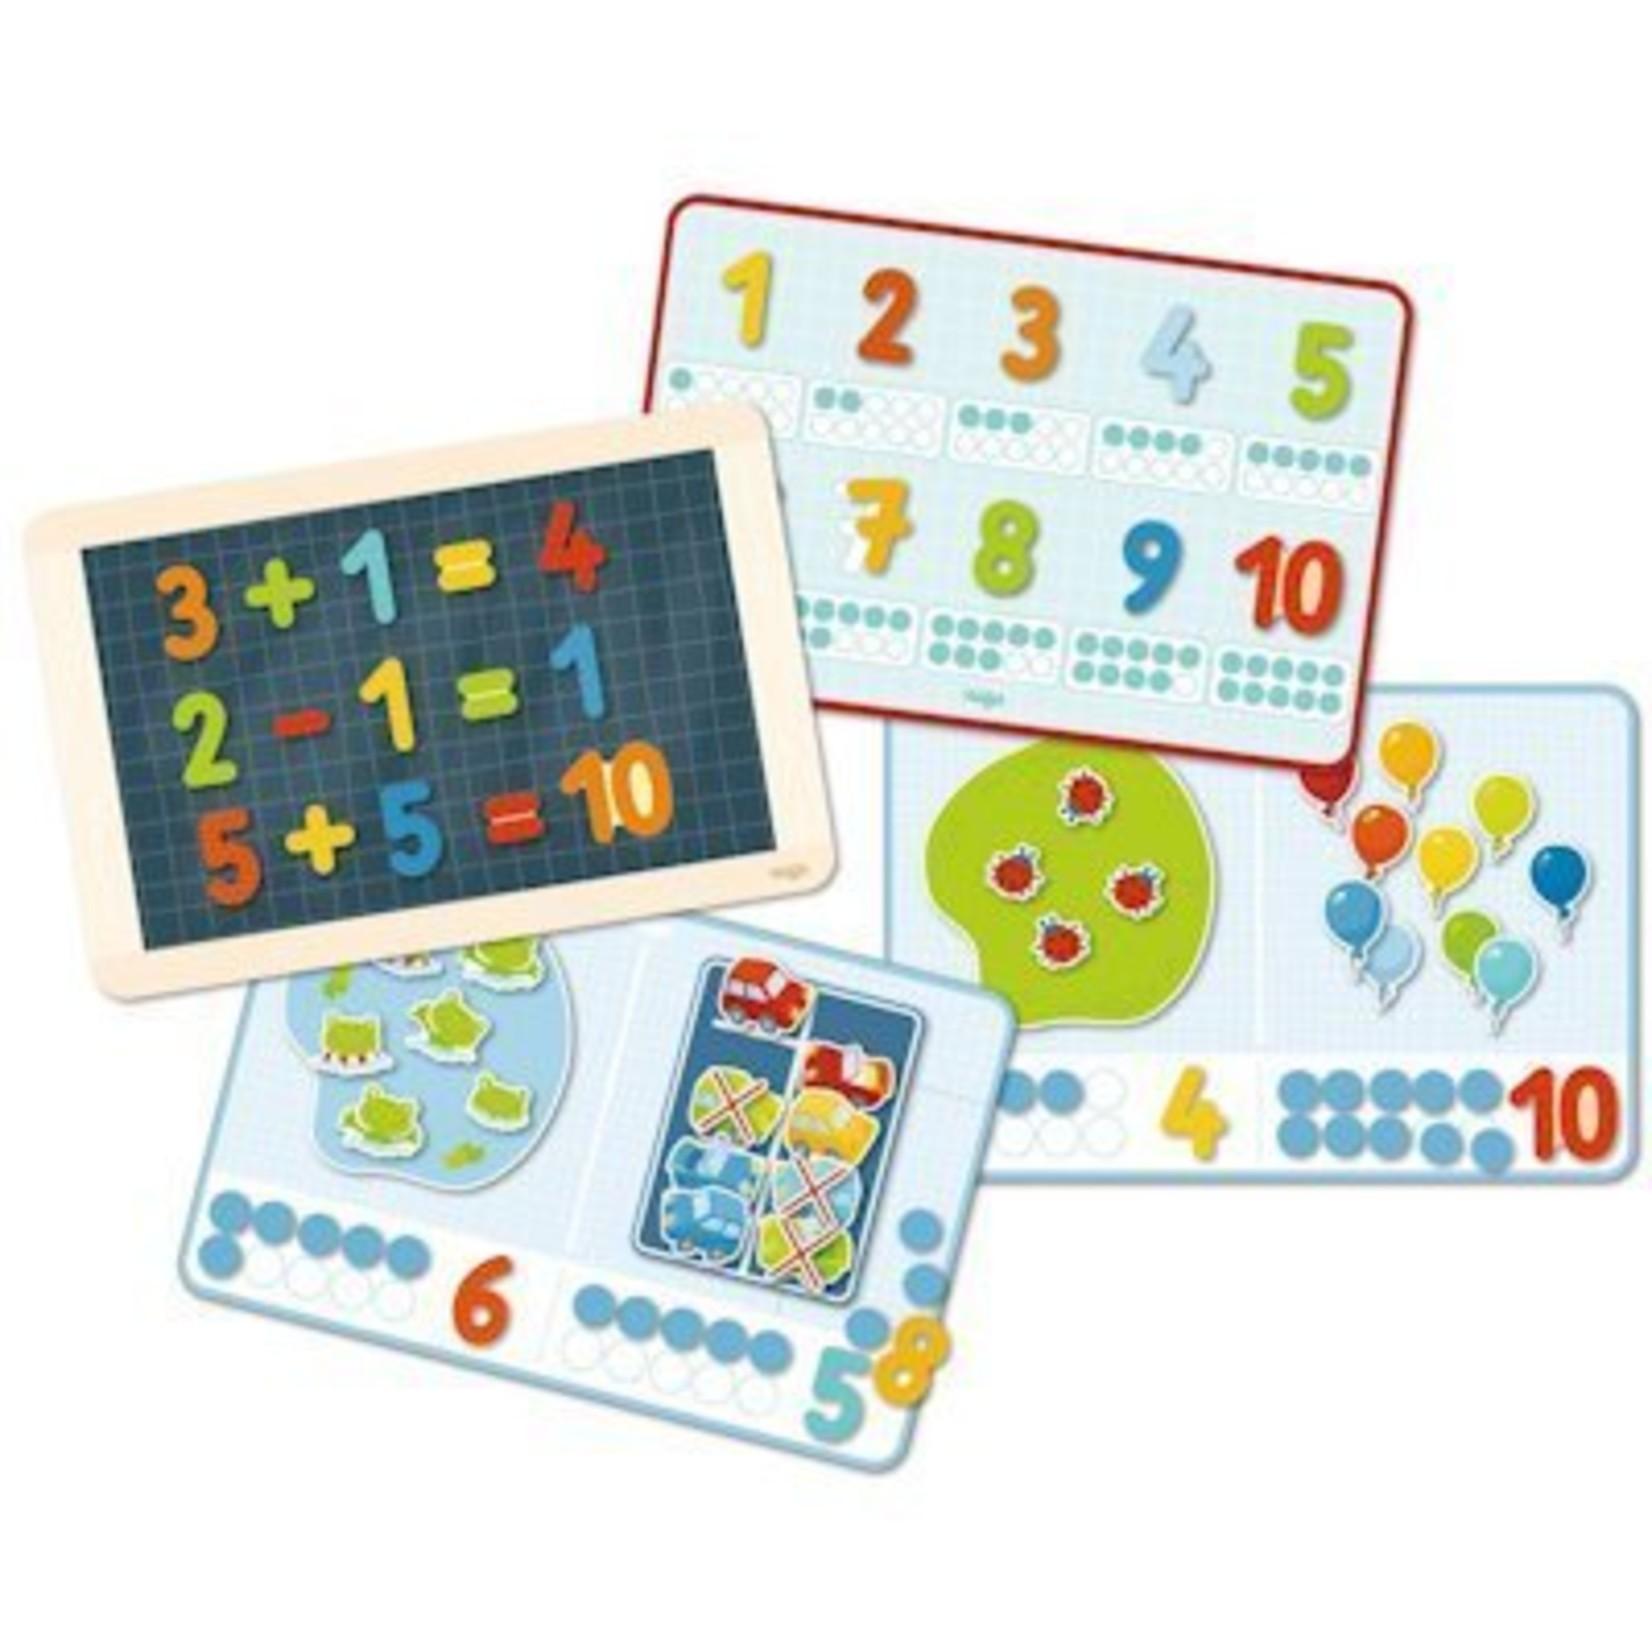 Haba Magneetspelbox 1, 2 tellerij